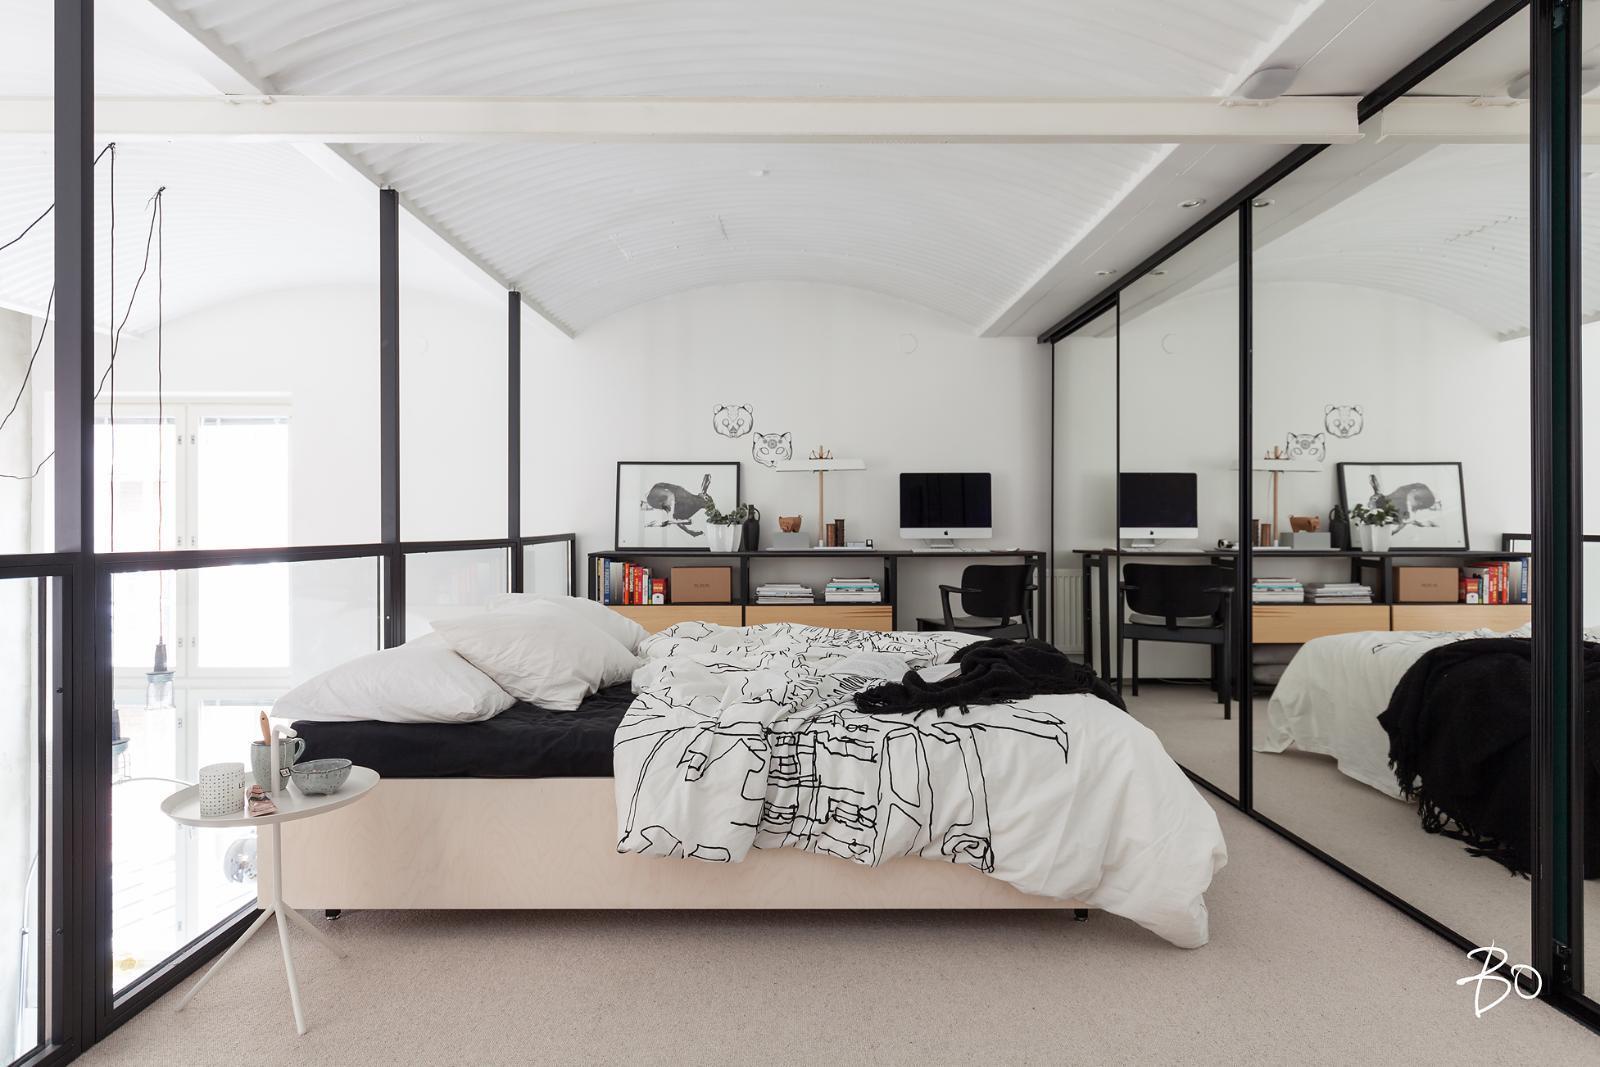 Suuri parvi loft-asunnossa - Etuovi.com Ideat   vinkit d09cd2cefd